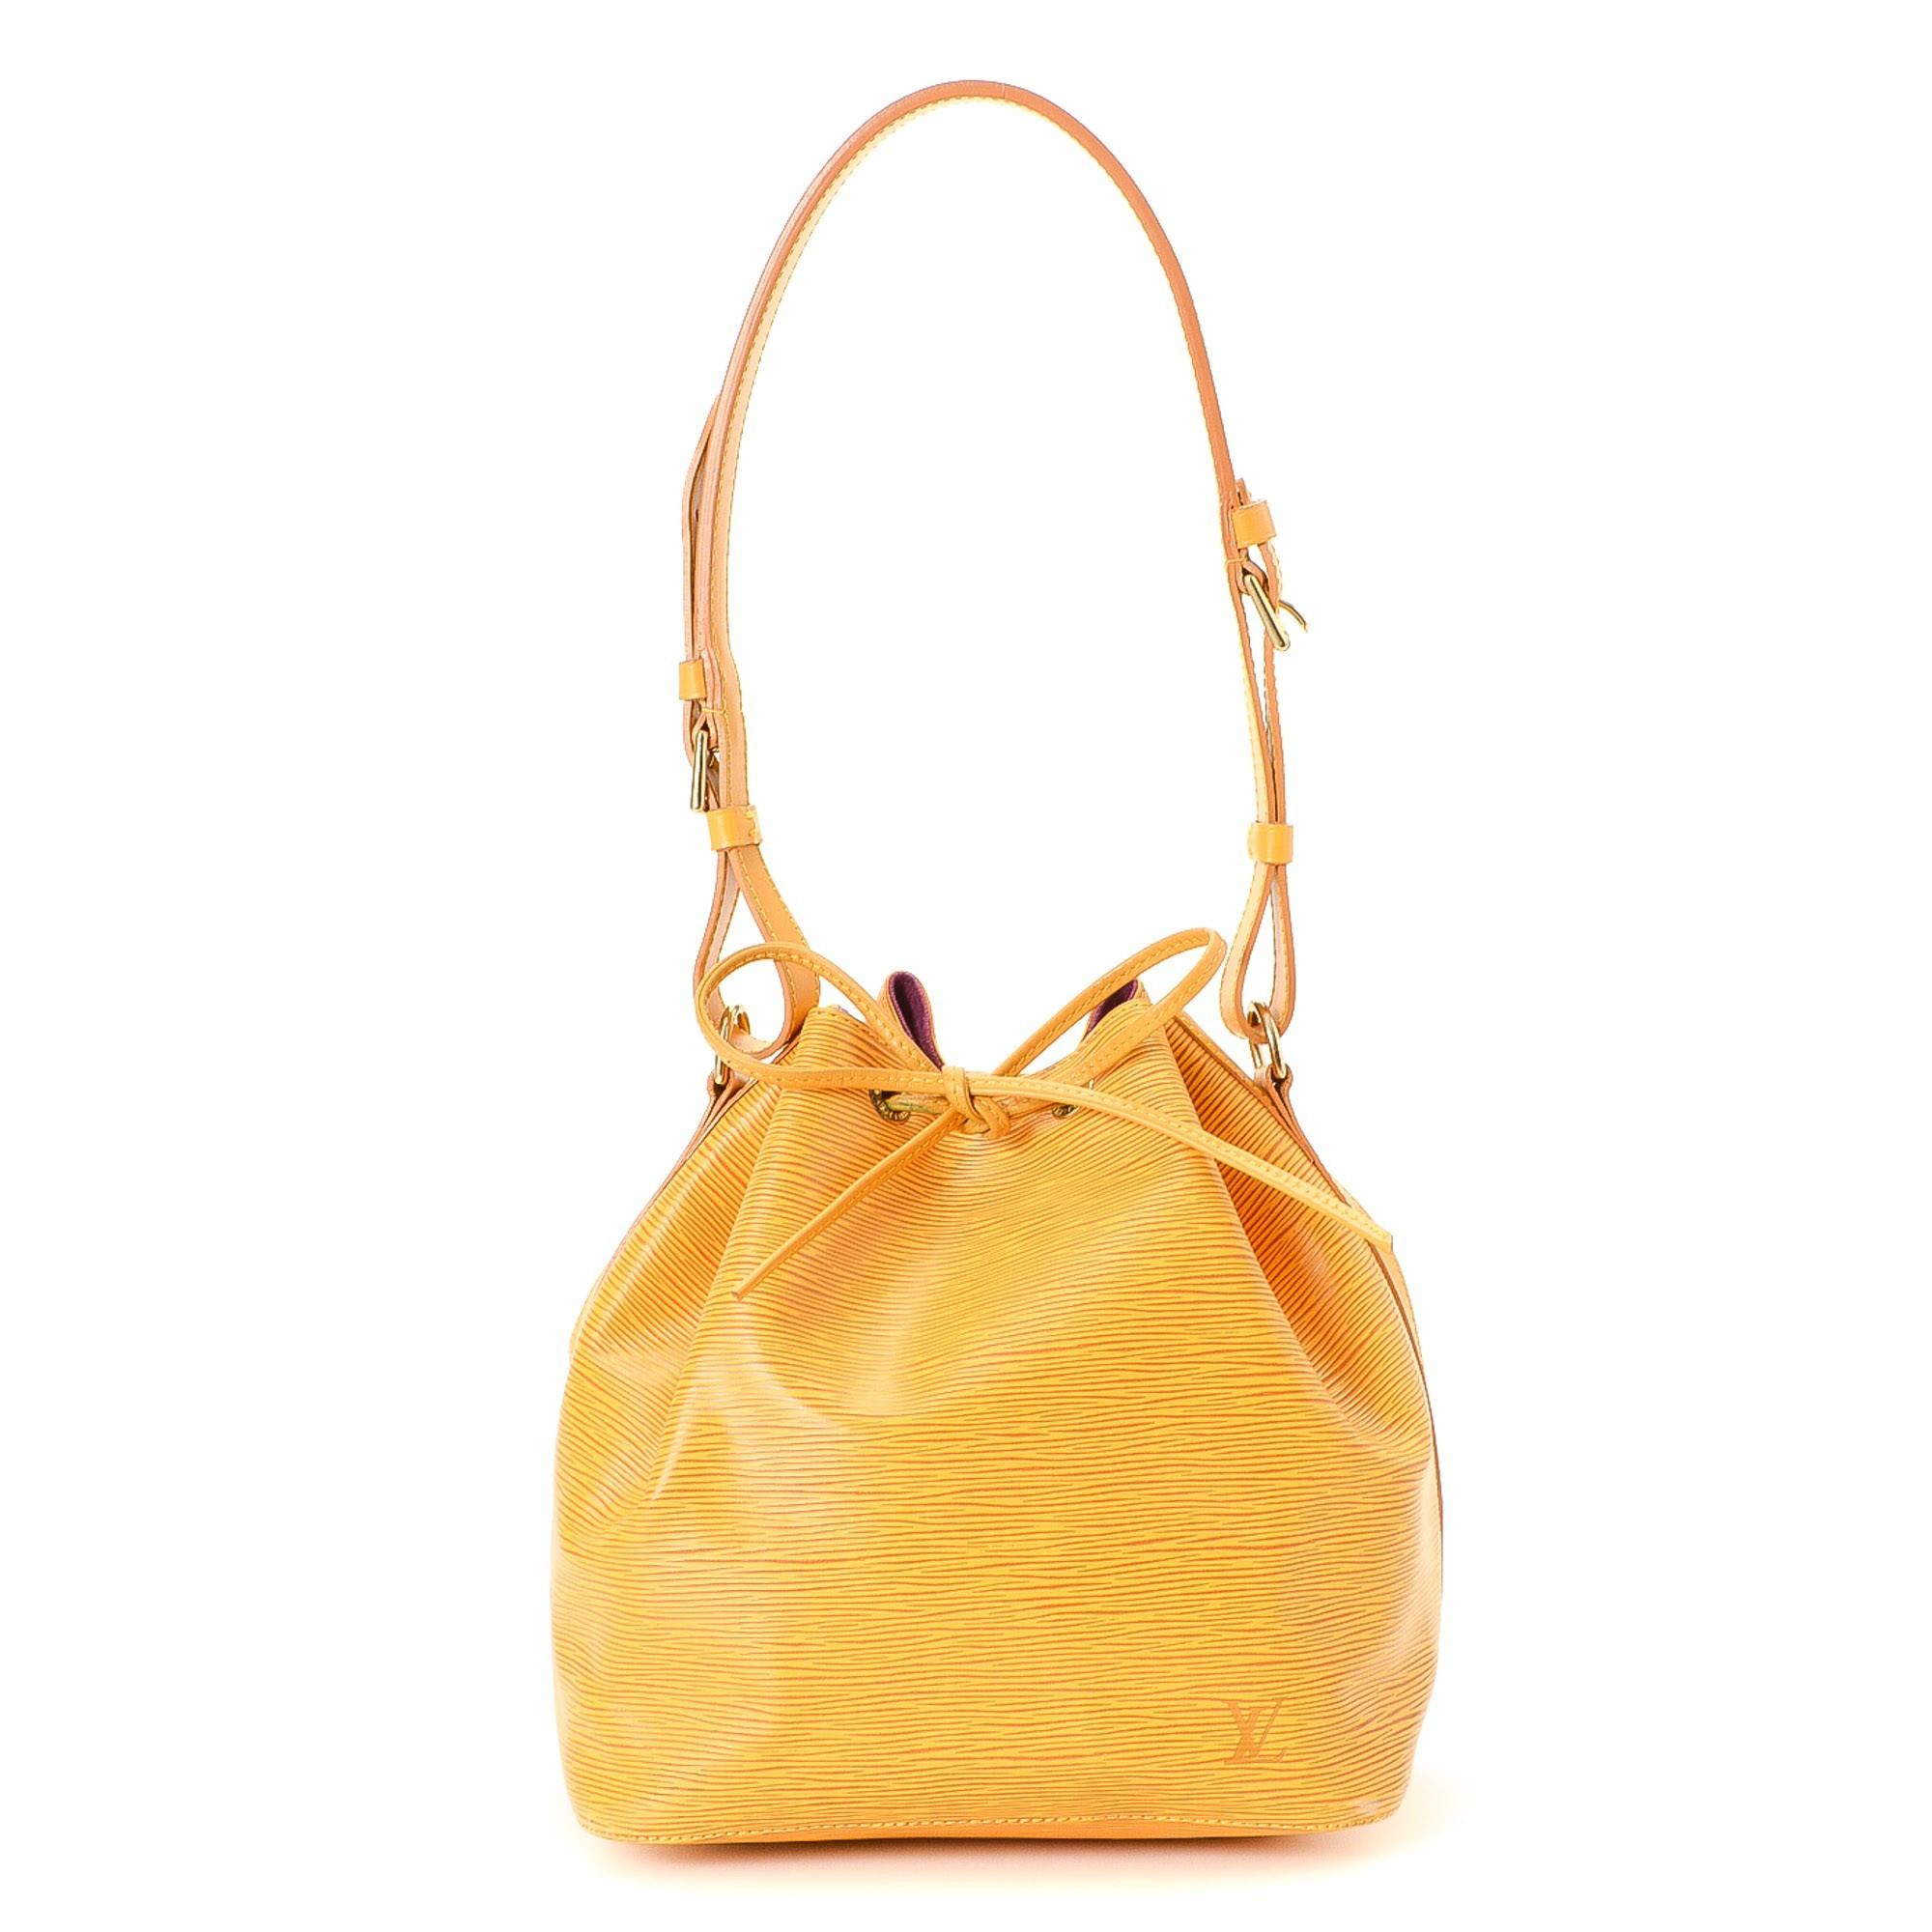 Louis Vuitton Petit Noe Epi Tassil yellow Leather Shoulder Bag LXRCO